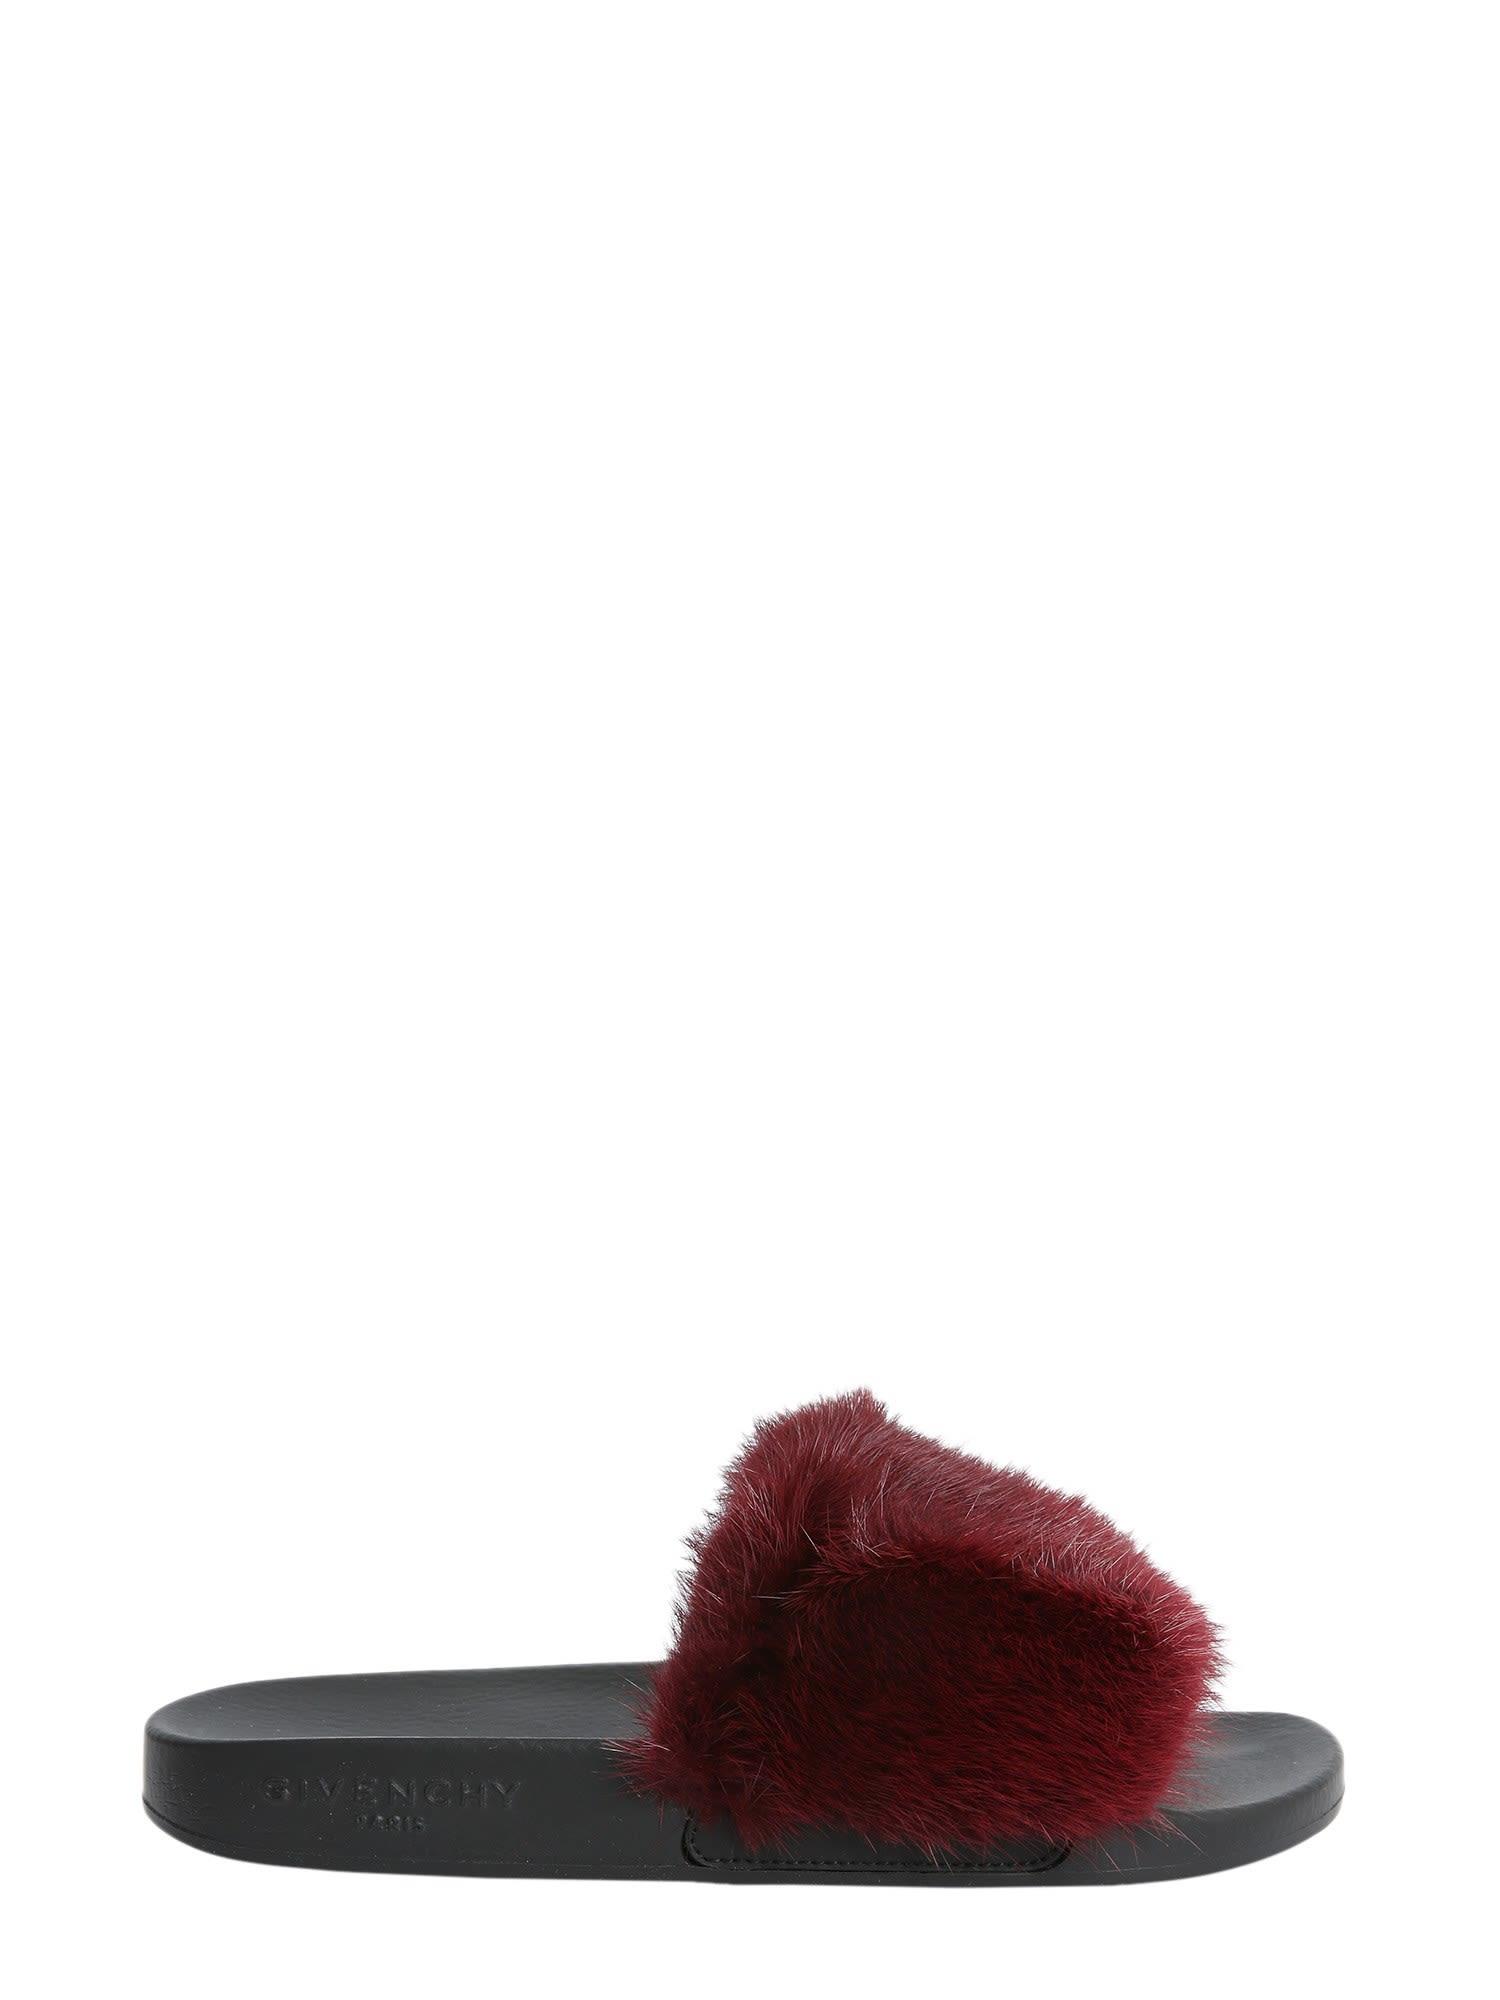 7091e7d86e2e8b Givenchy Mink Fur Slide Sandals